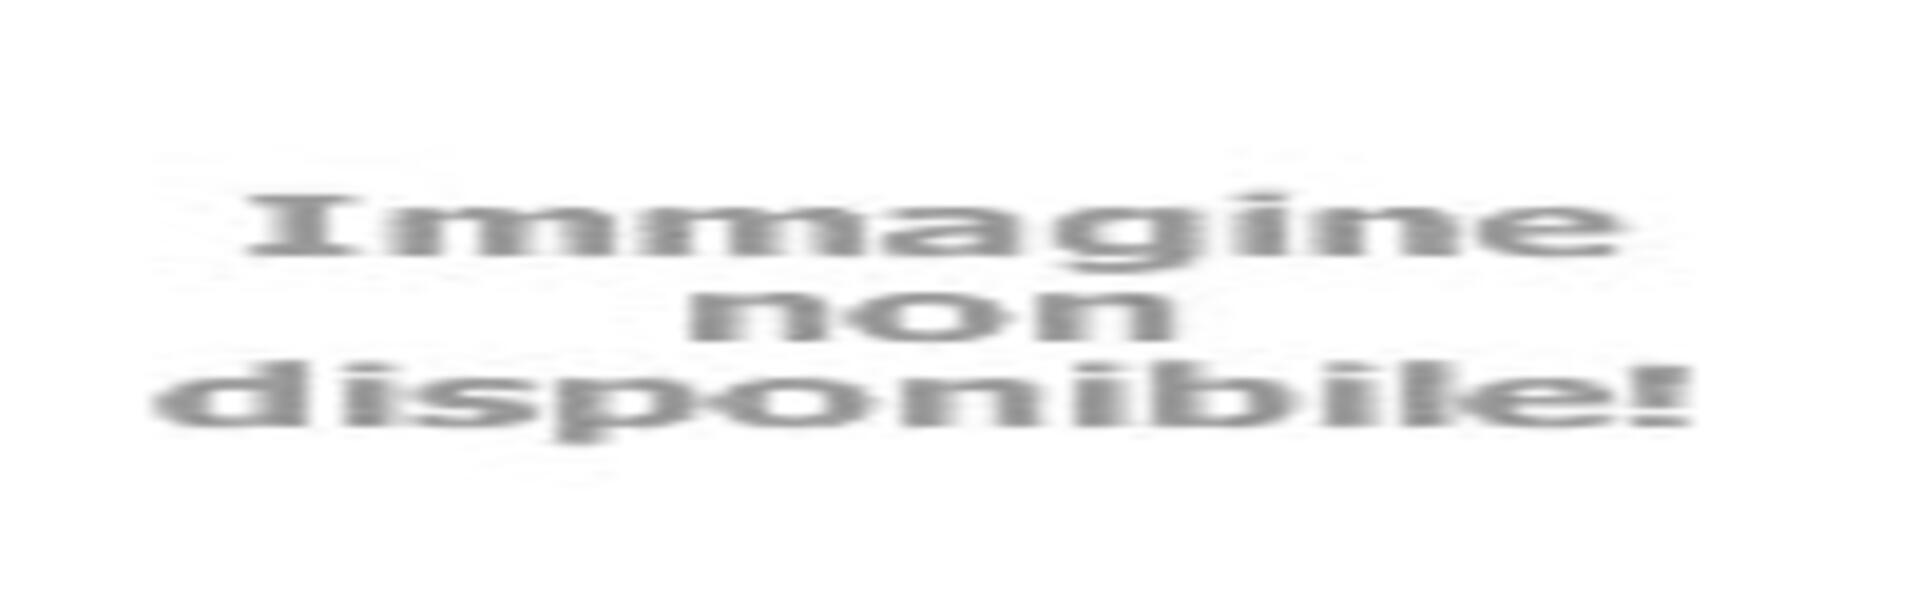 epochehotel.upgarda de urlaub-klettern-trekking-bike-trentino 008